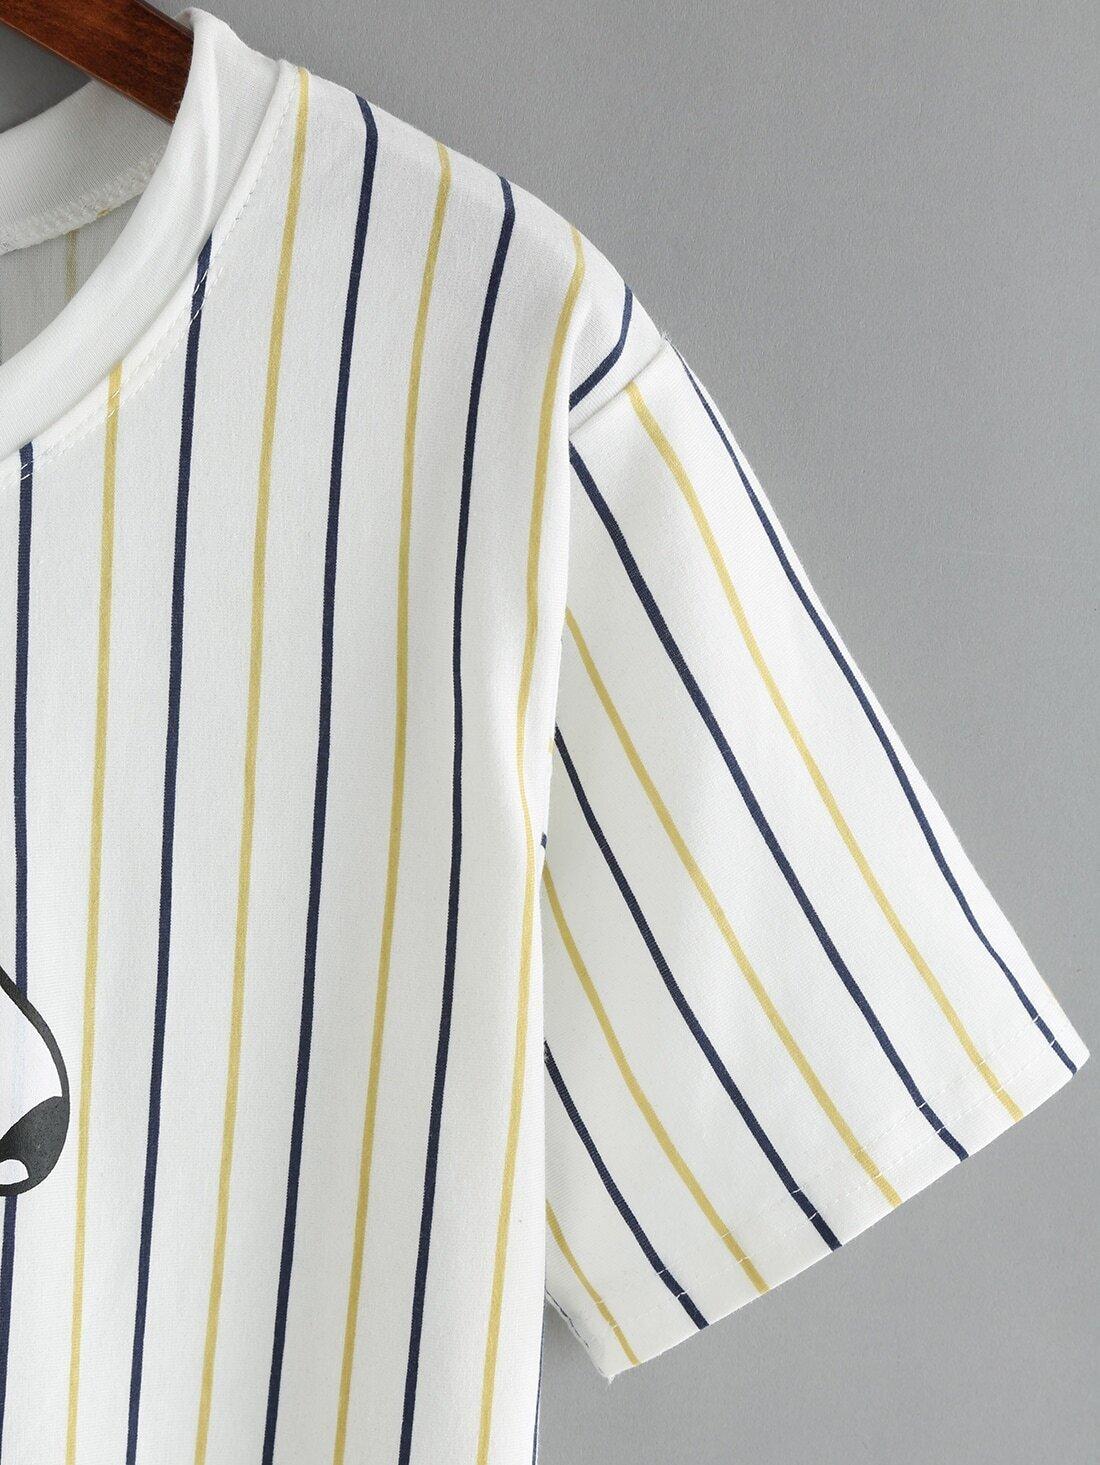 Vertical Striped Dog Print T-Shirt -SheIn(Sheinside)